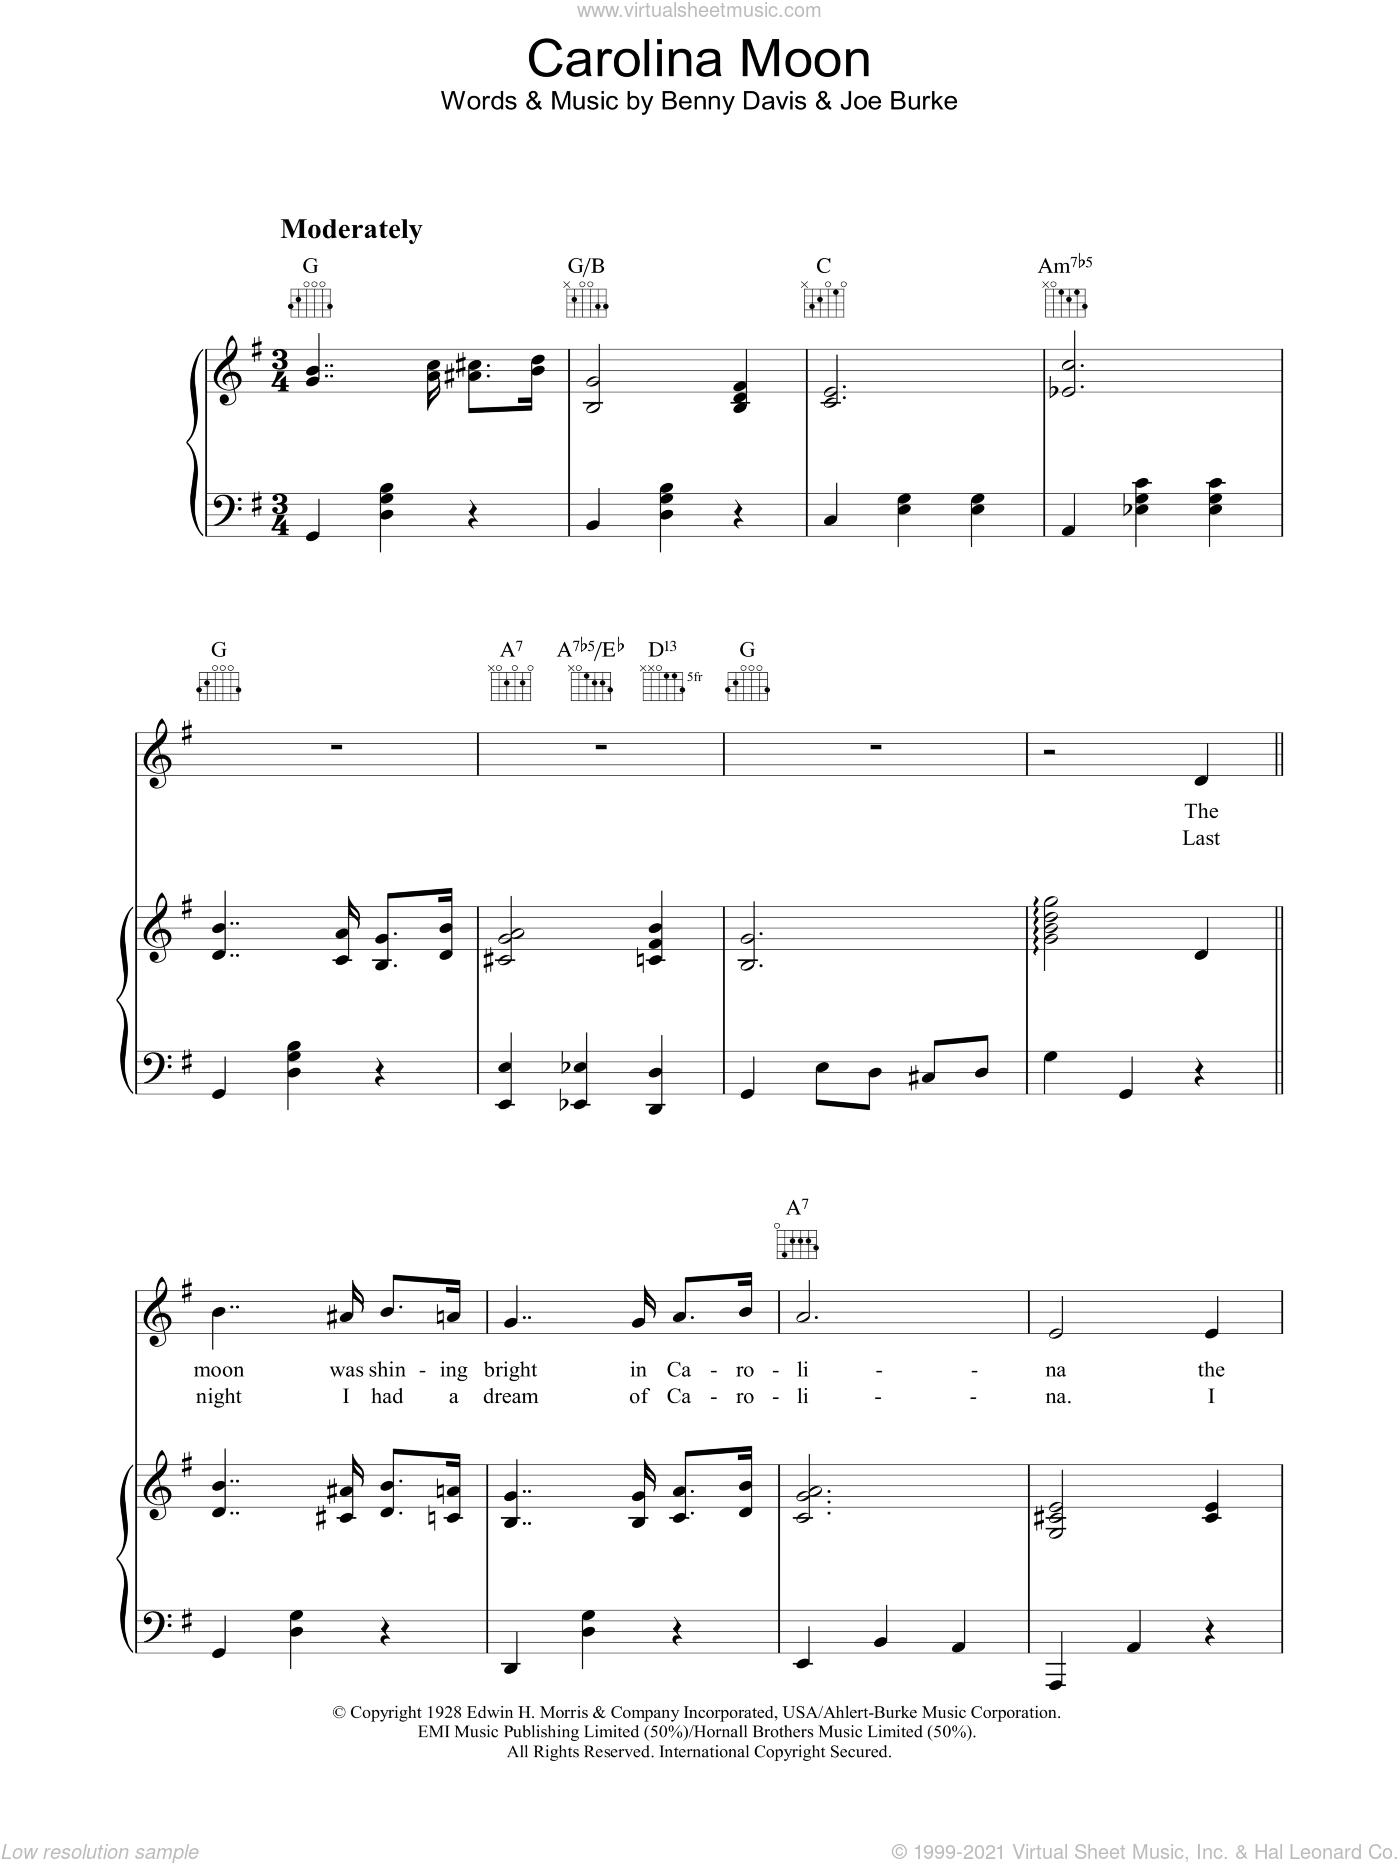 Carolina Moon sheet music for voice, piano or guitar by Benny Davis and Joe Burke, intermediate skill level